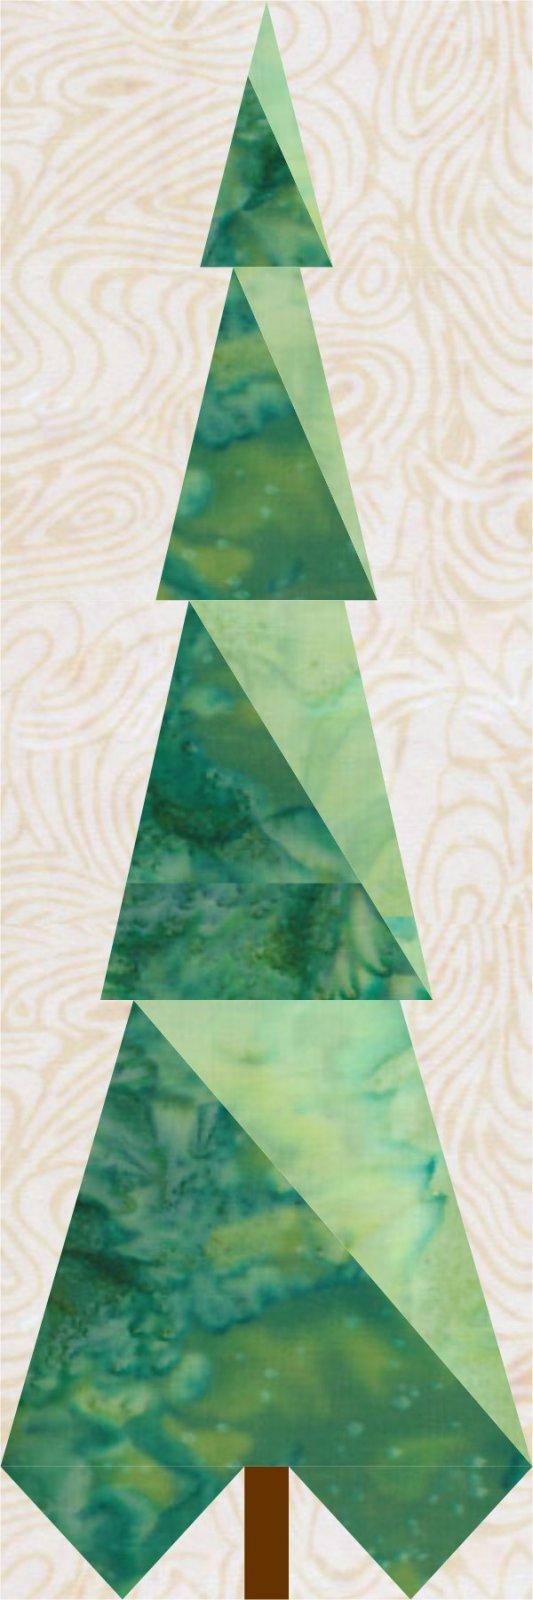 Season of Lights BOM Bonus Block 3: Snowy Tree